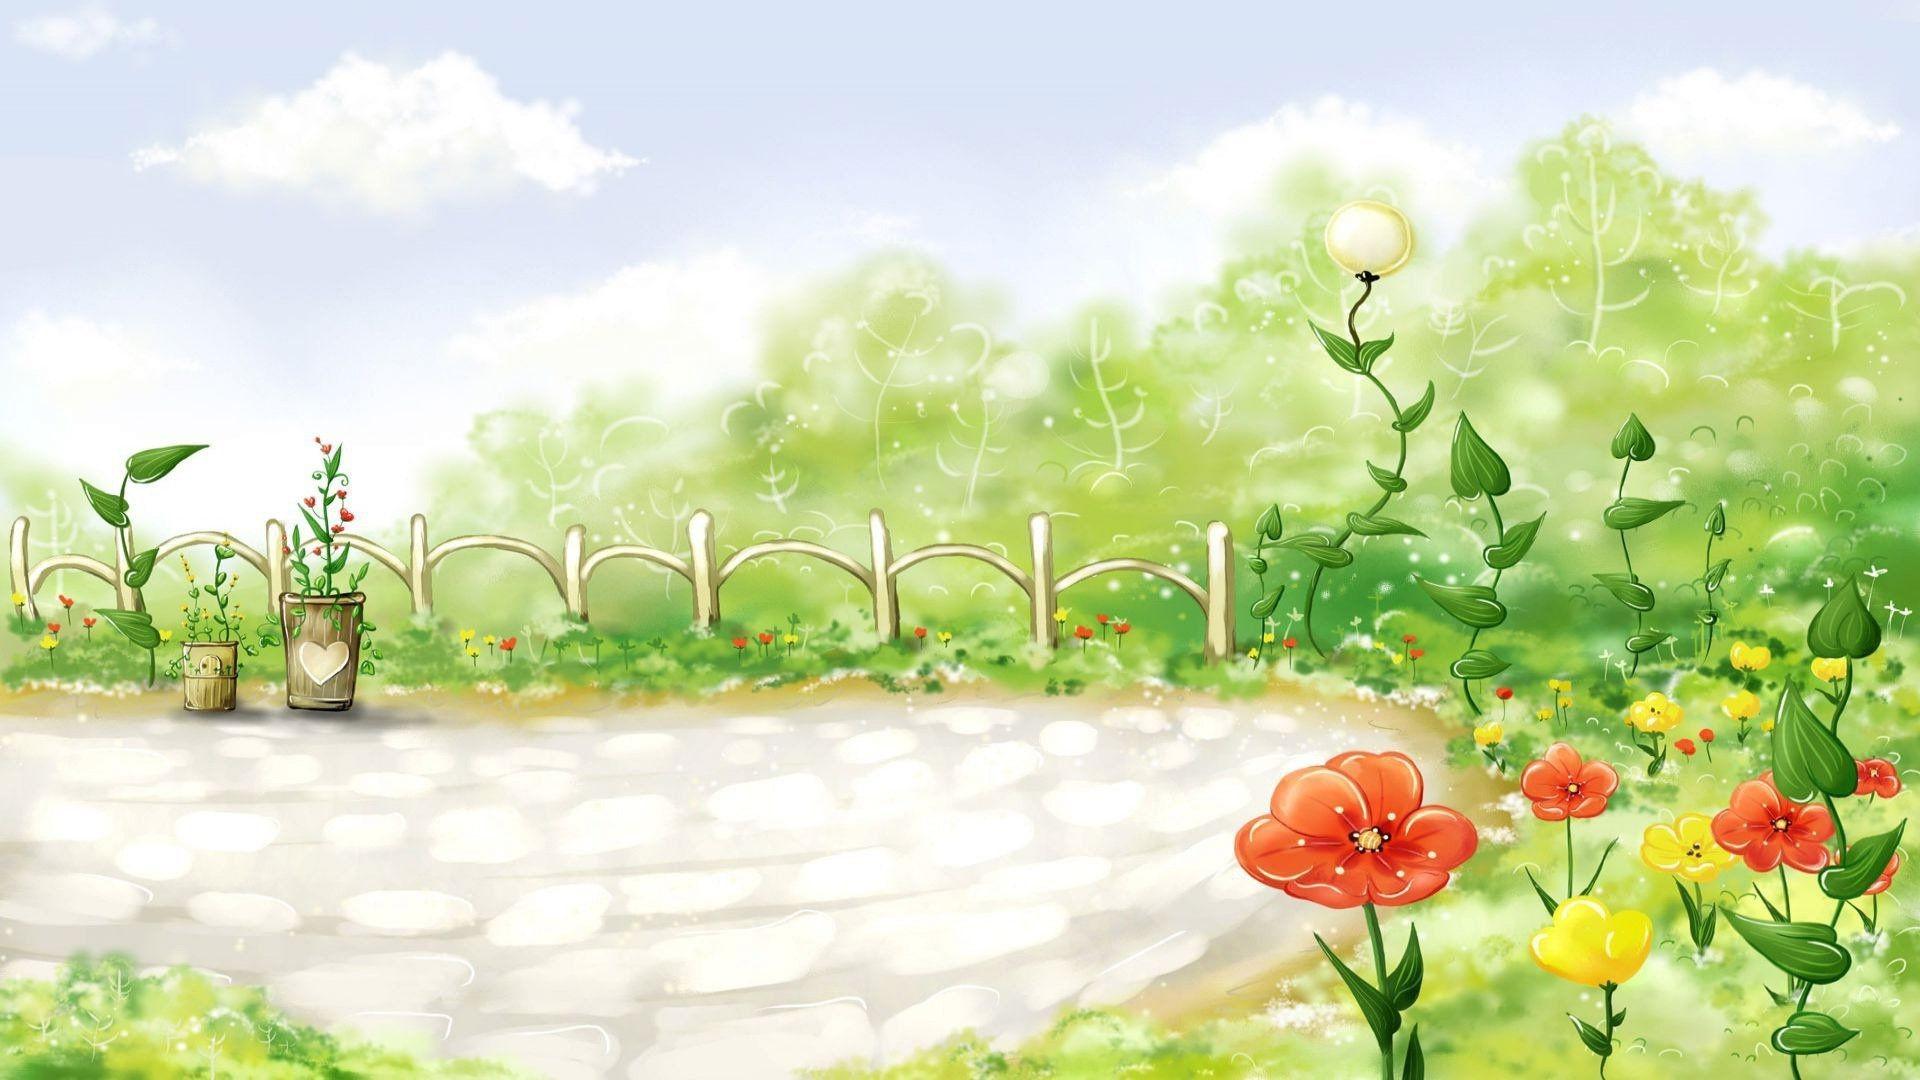 Cartoon Spring Wallpaper (57+ images)